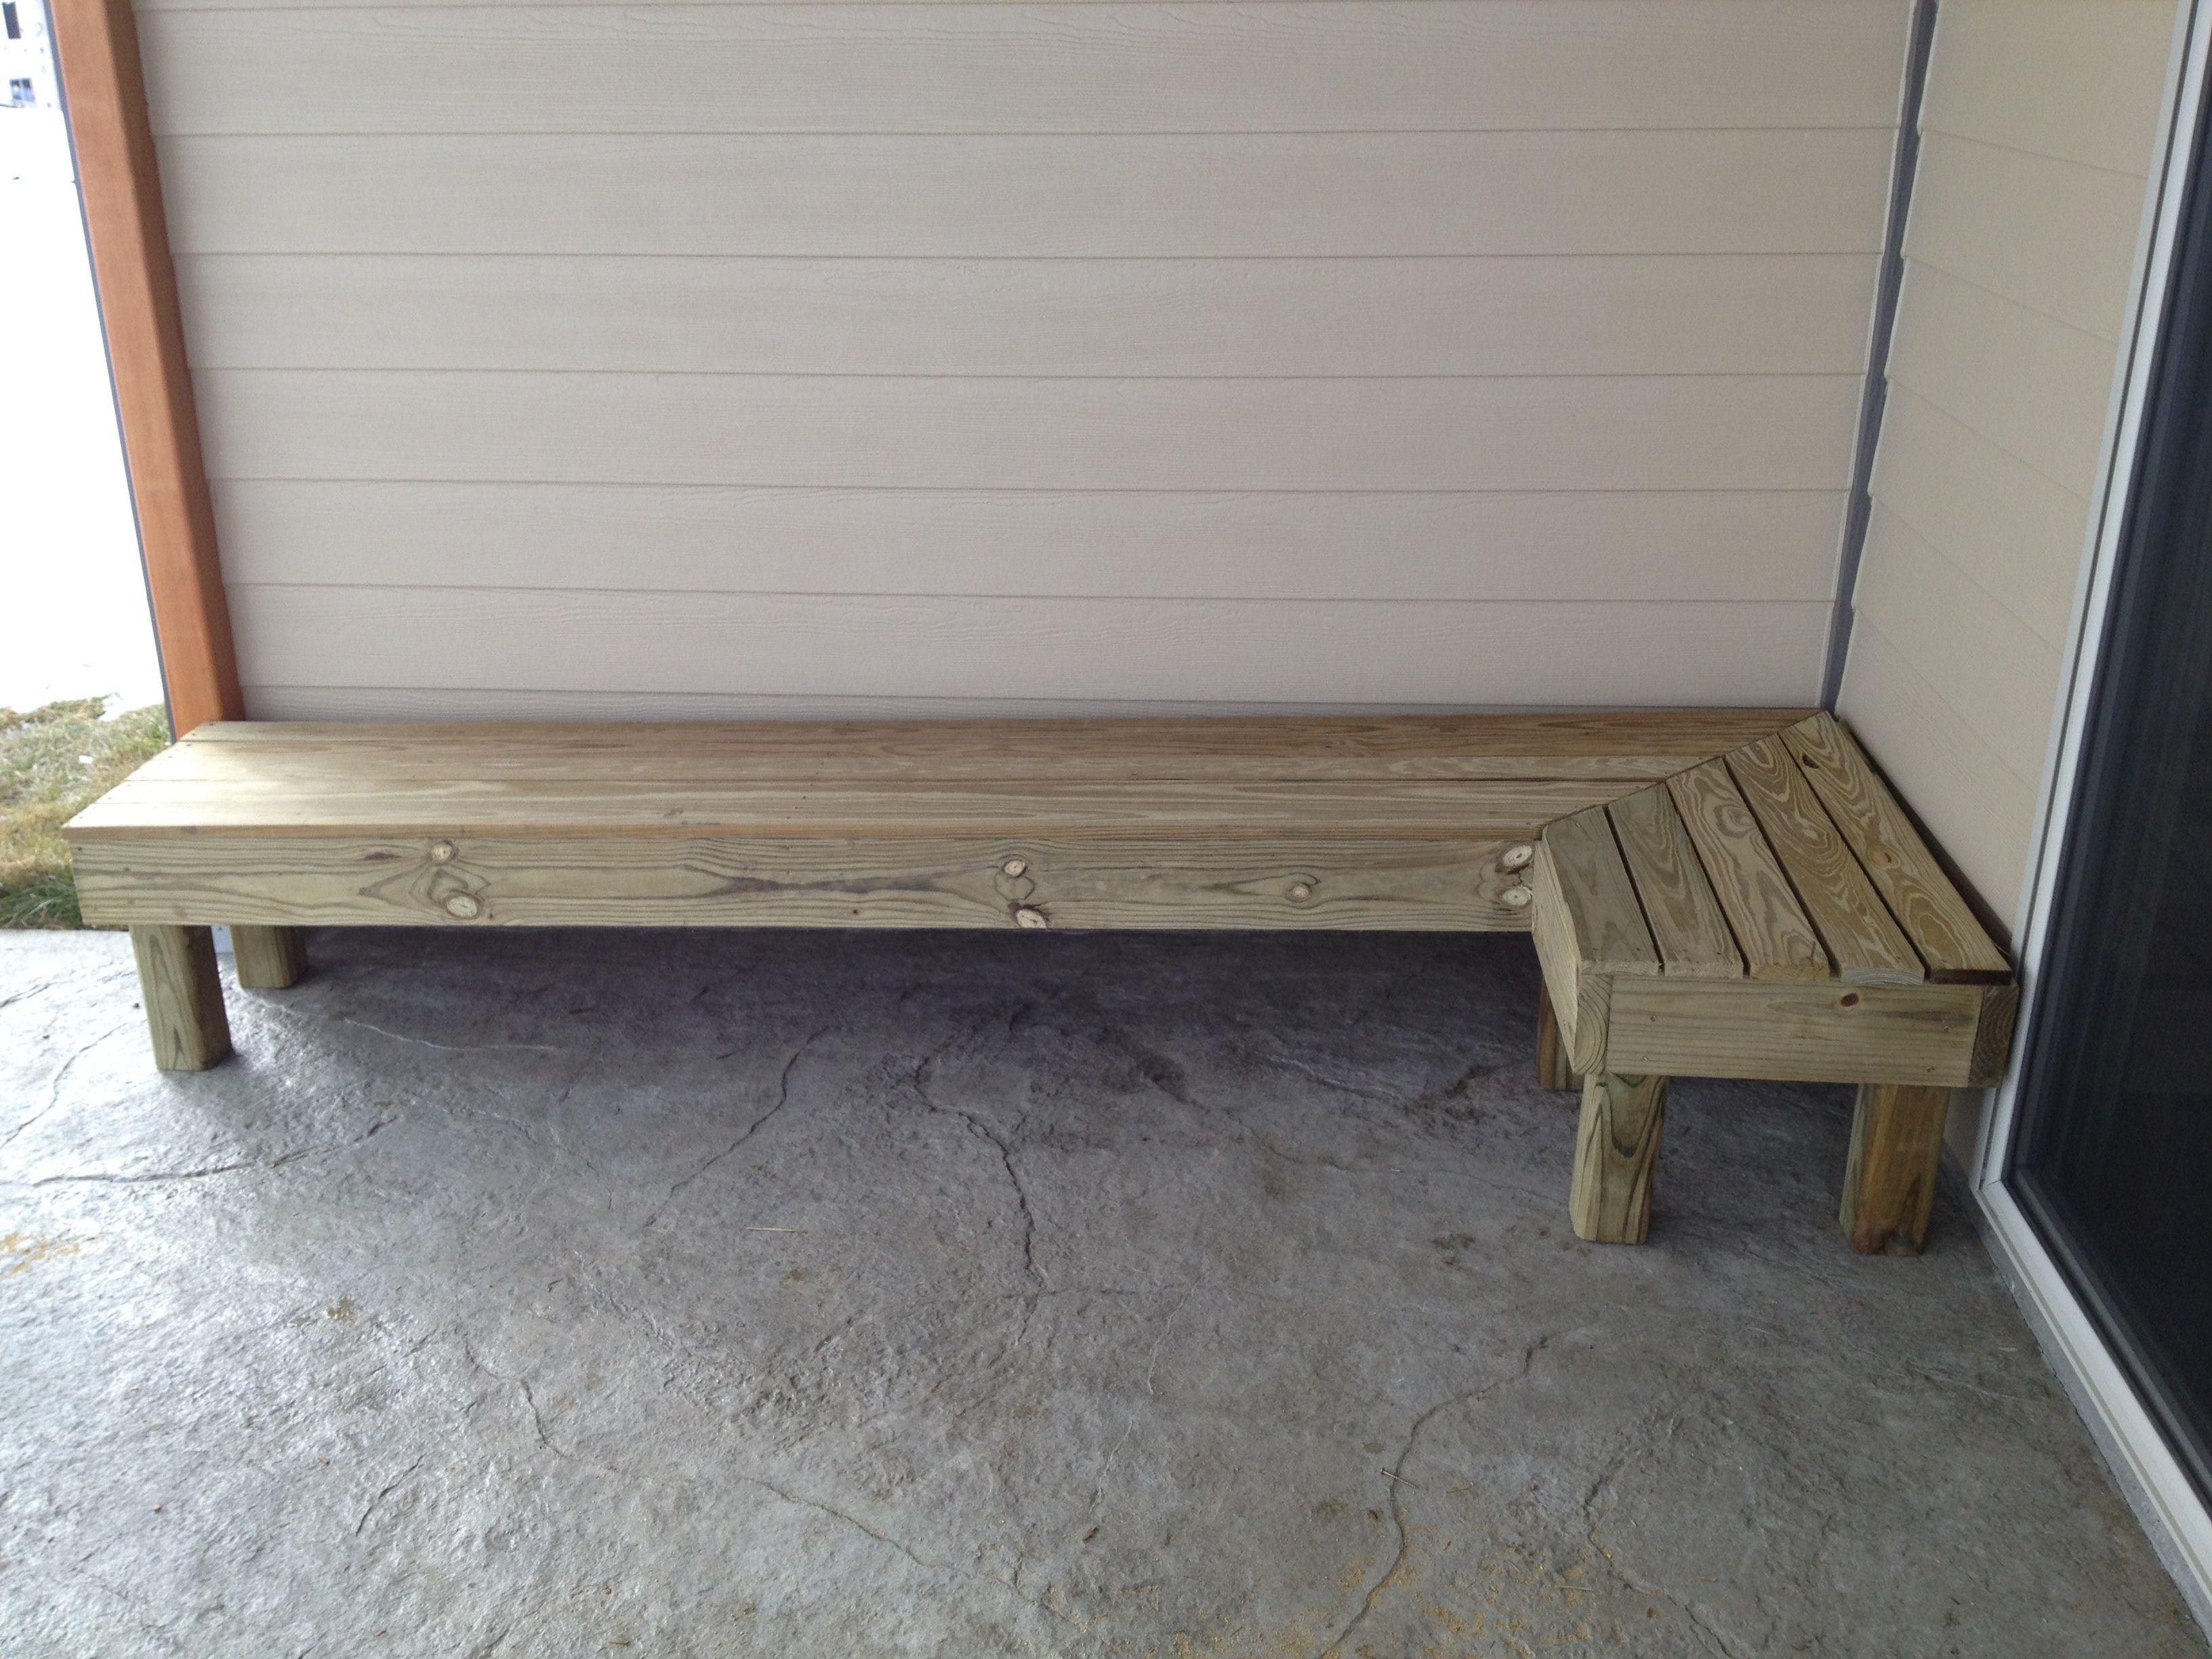 wrap around patio bench | diy | pinterest | patio bench, patios ... - Patio Bench Ideas